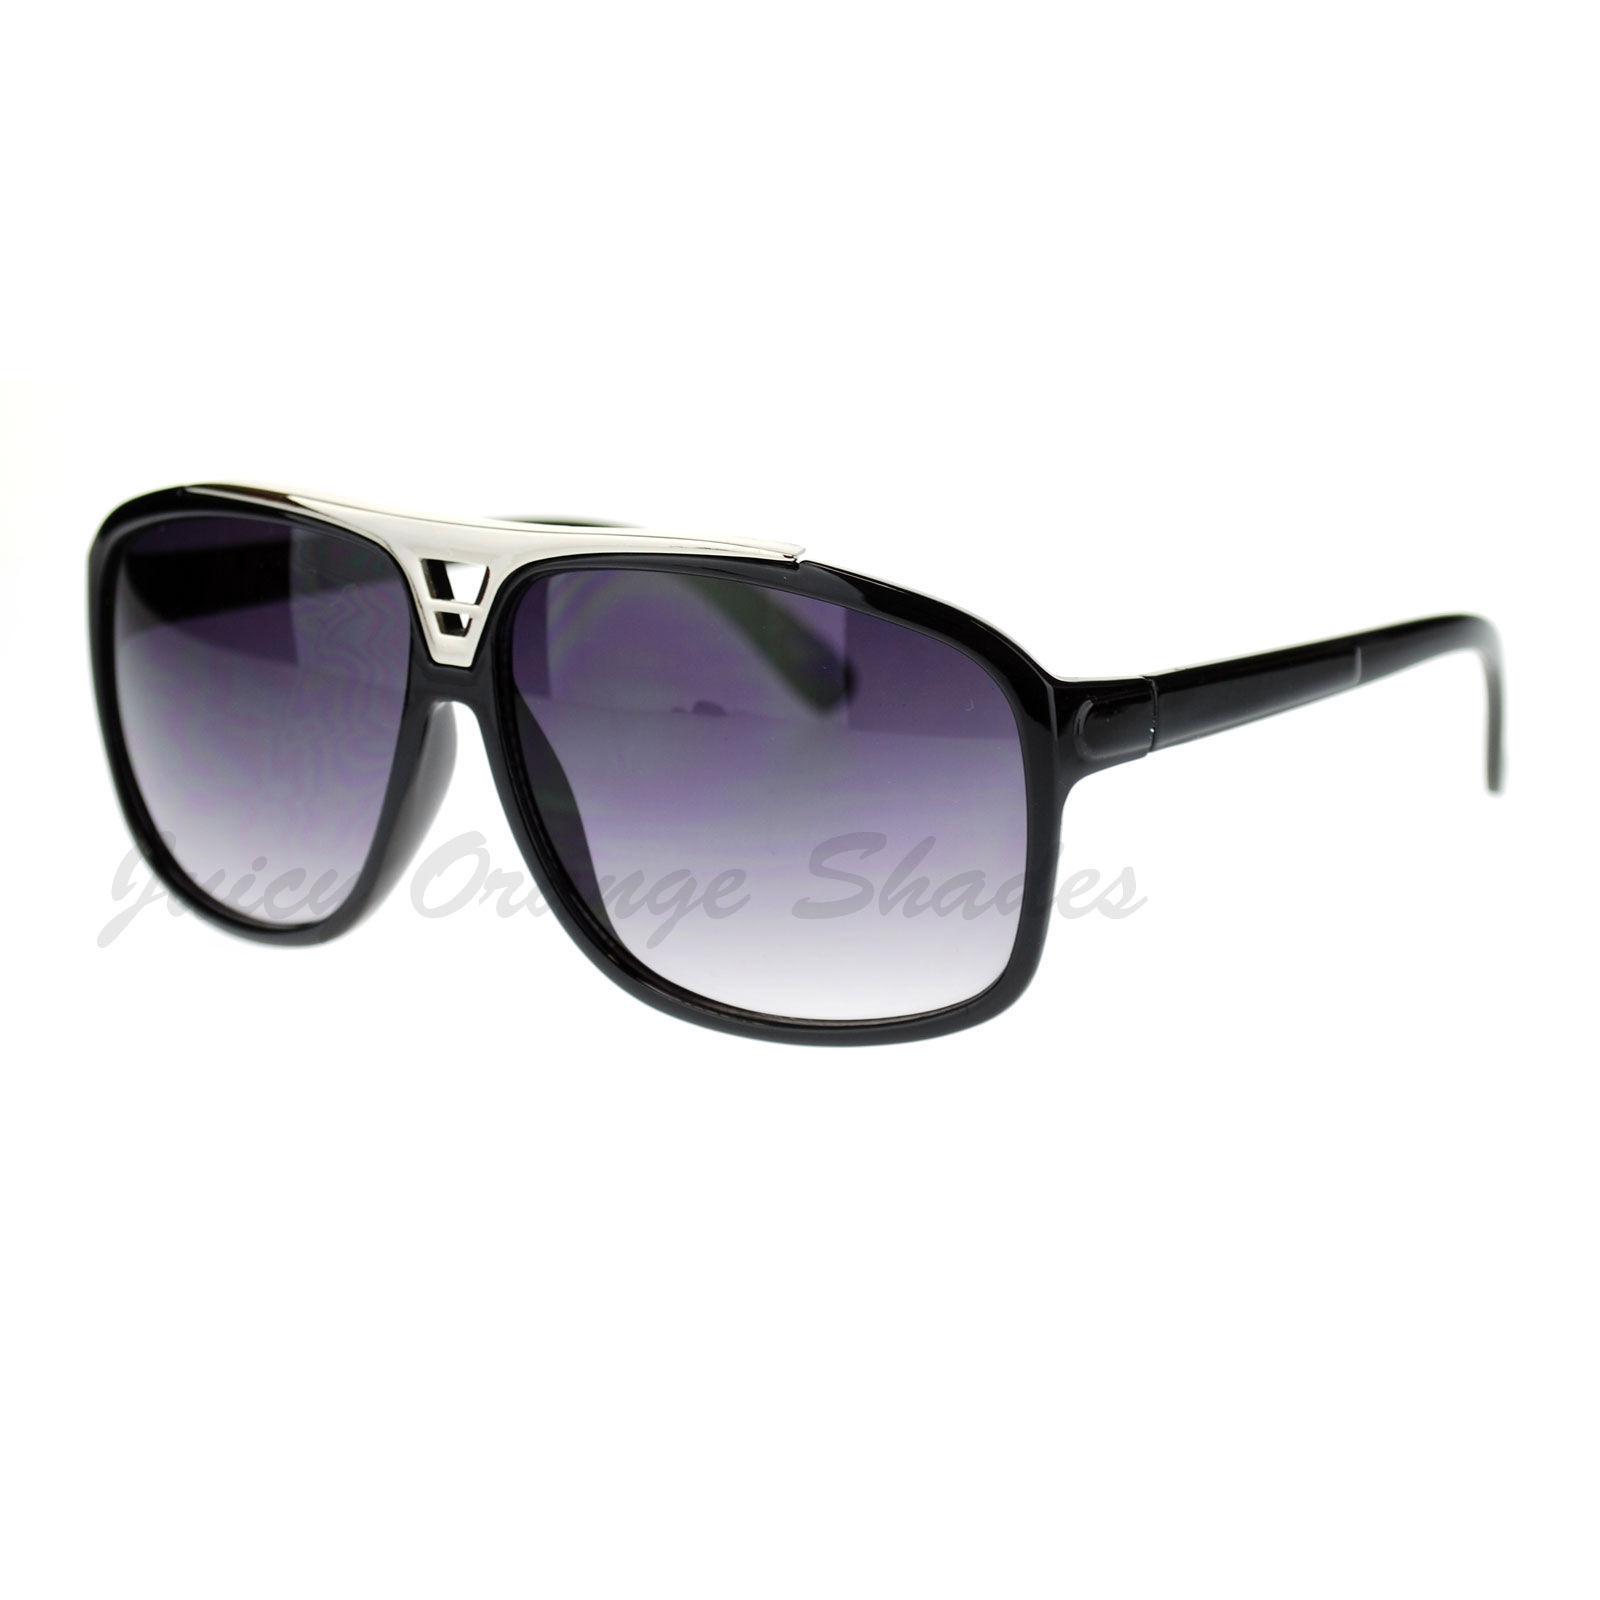 Retro Unisex Square Frame Sunglasses Top Designer Fashion Shades